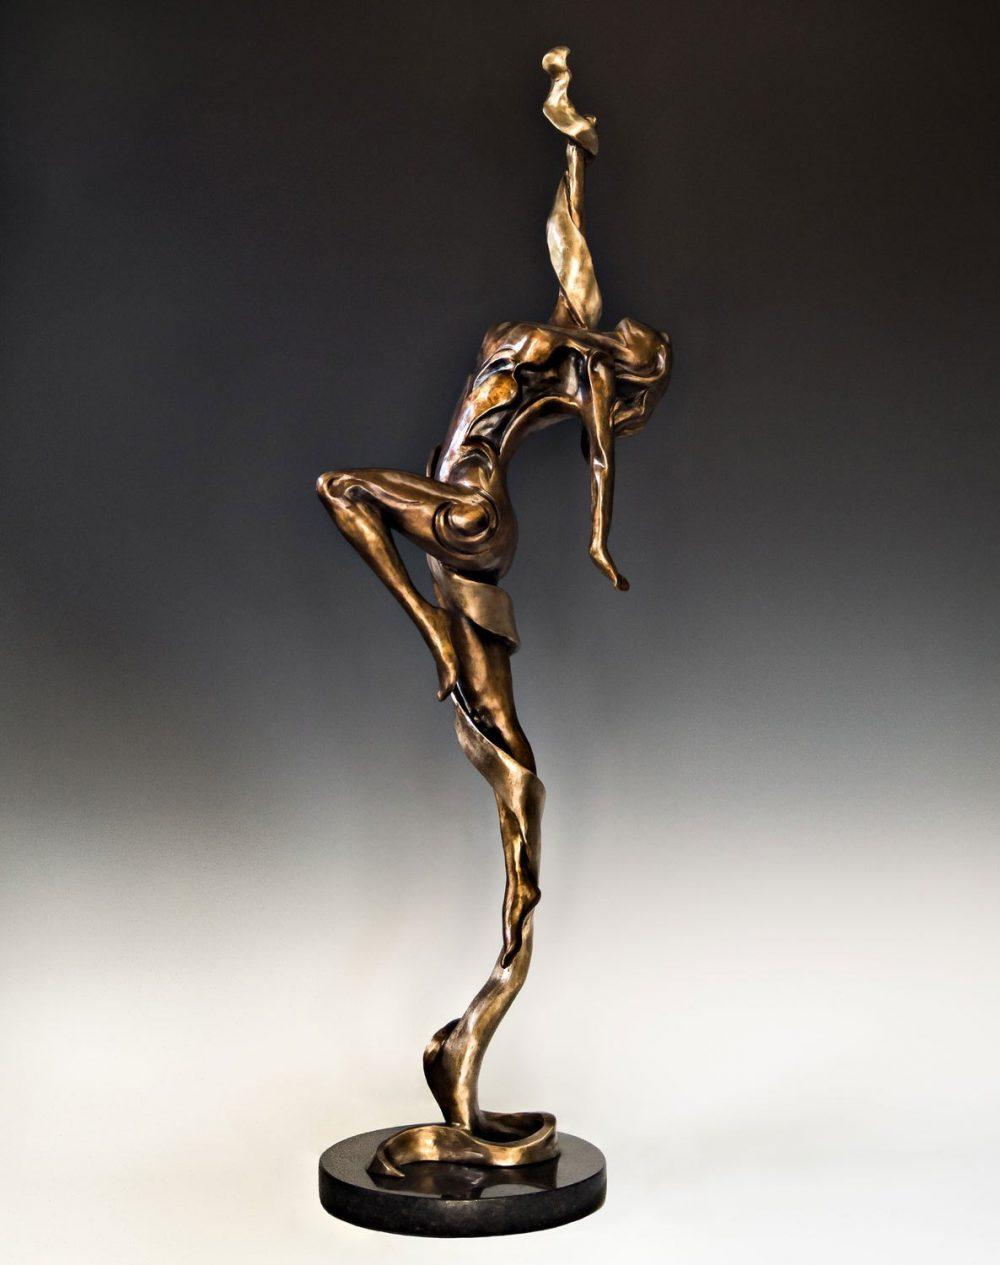 Carpe Diem | Scy Caroselli | Sculpture-Exposures International Gallery of Fine Art - Sedona AZ